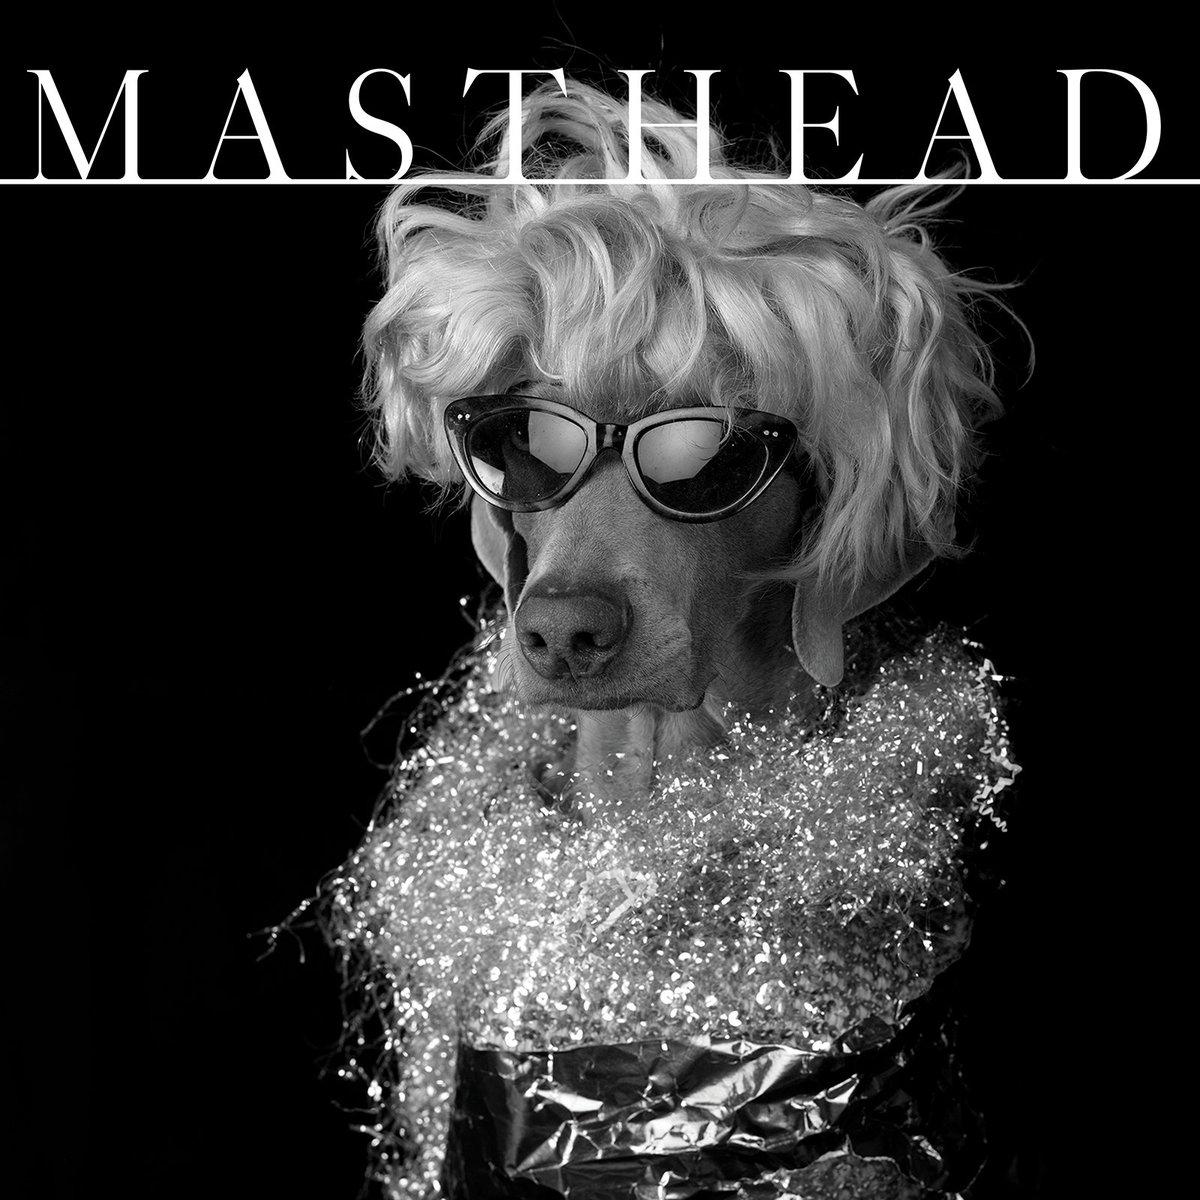 People are aliens. Dogs are old movie stars. @mastheadonline #mastheadmagazine https://t.co/iR7khDAPib